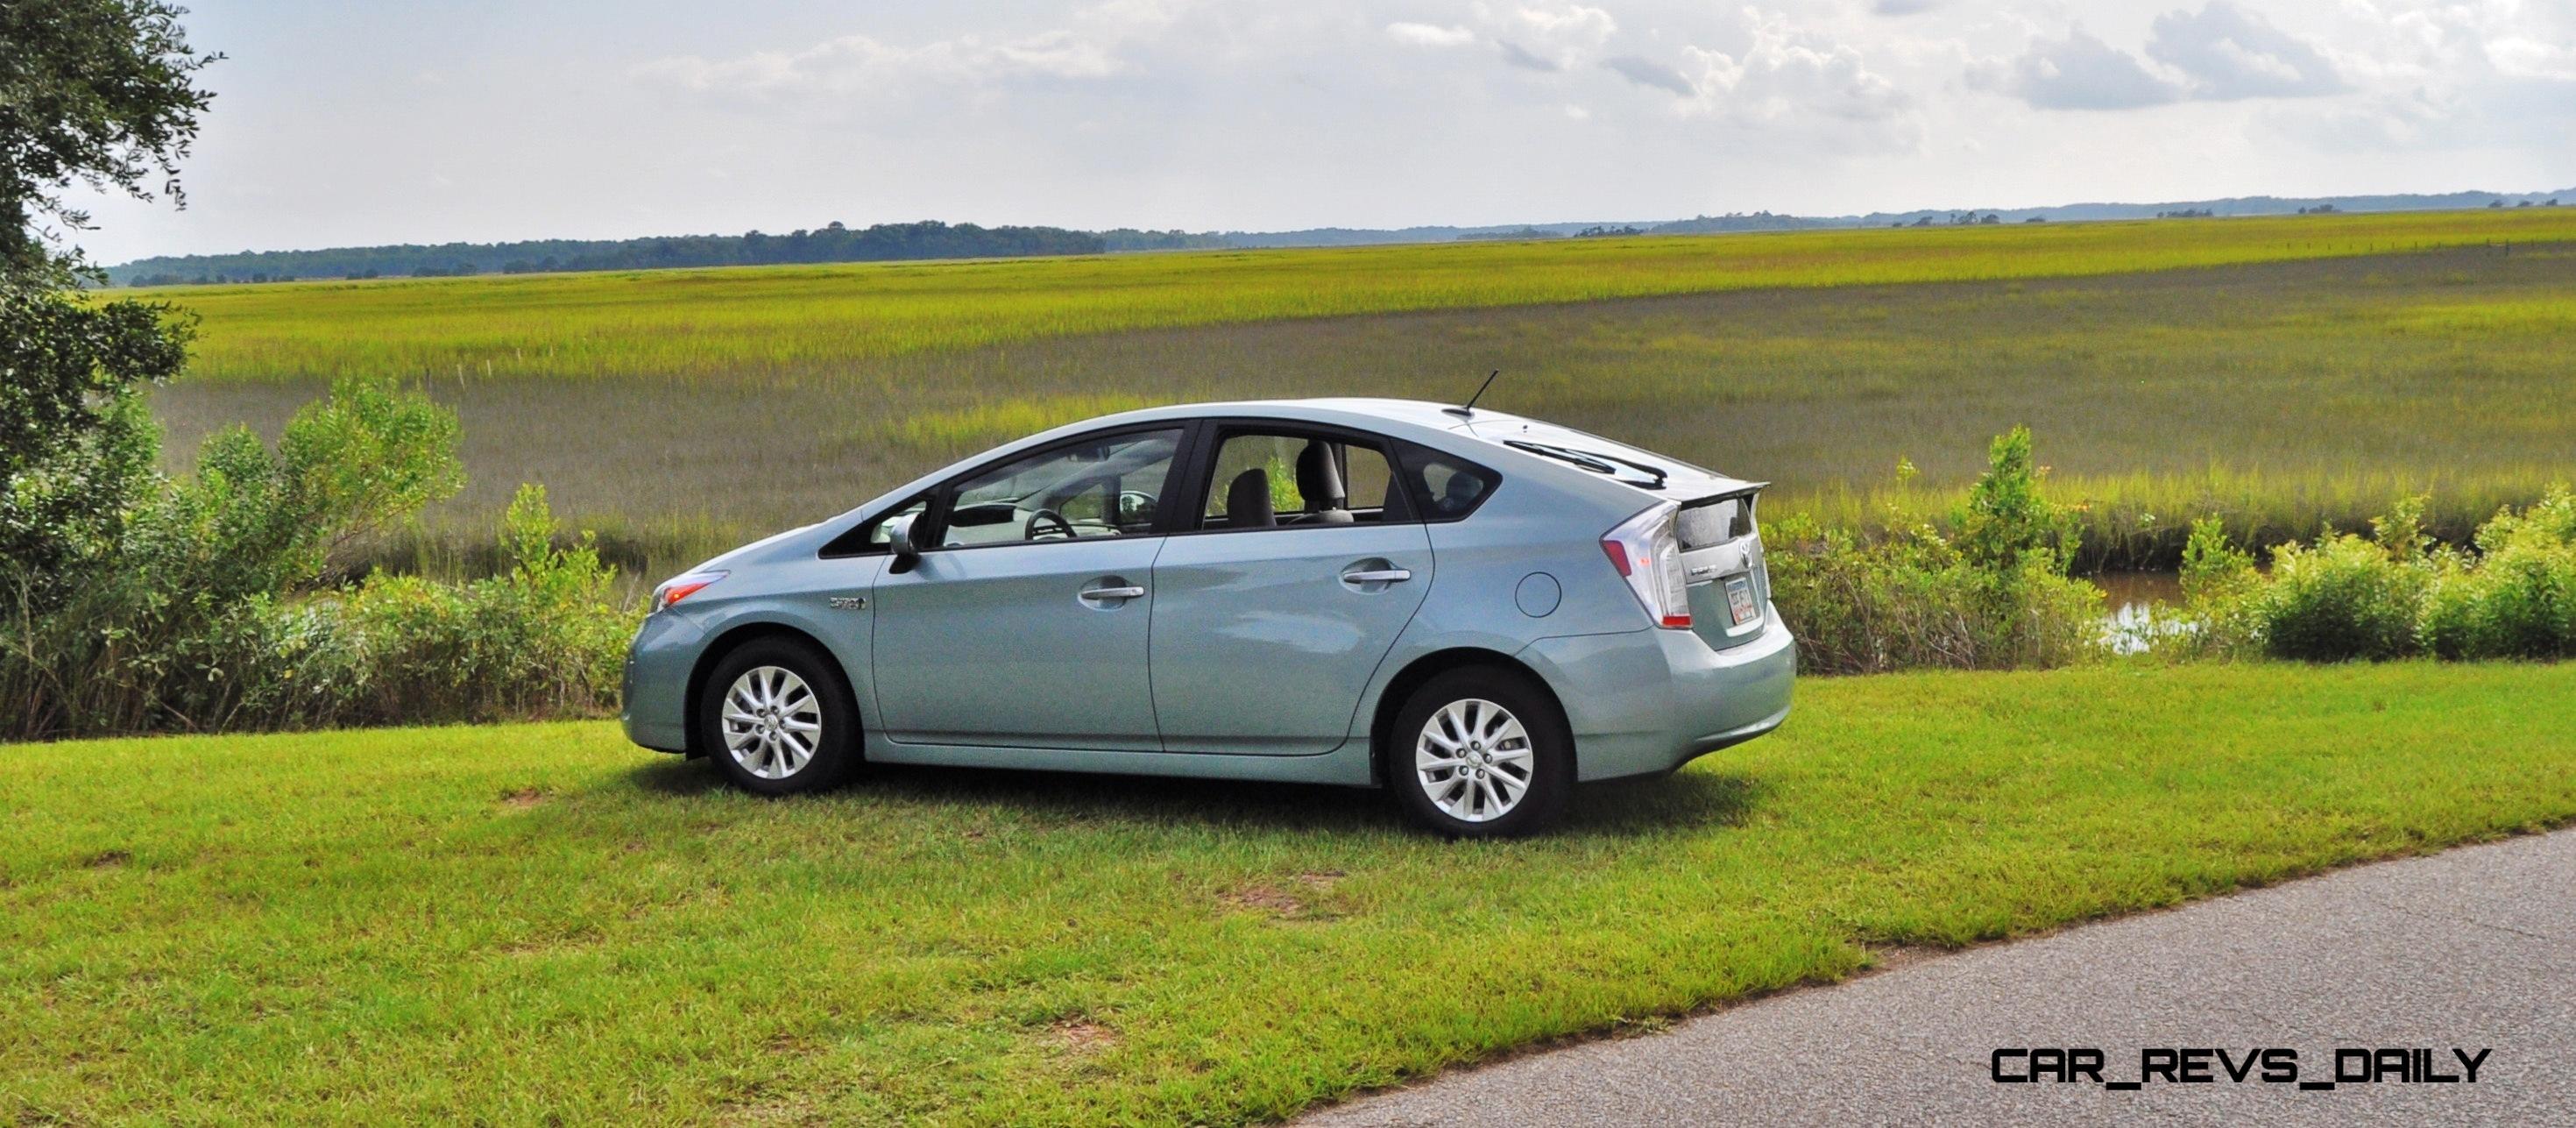 Toyota Prius Heads Up Display